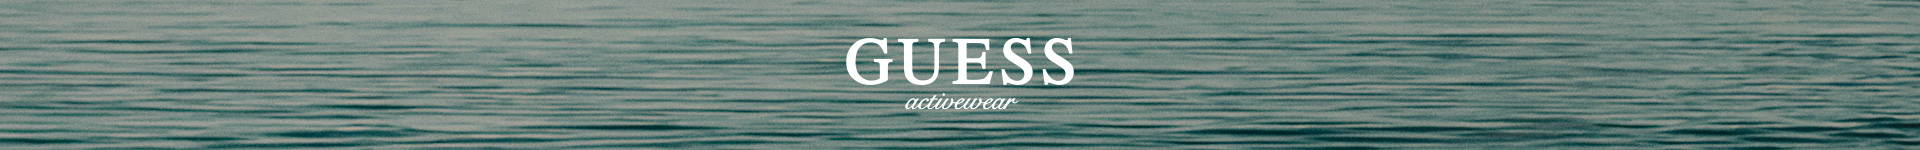 GUESS Activewear